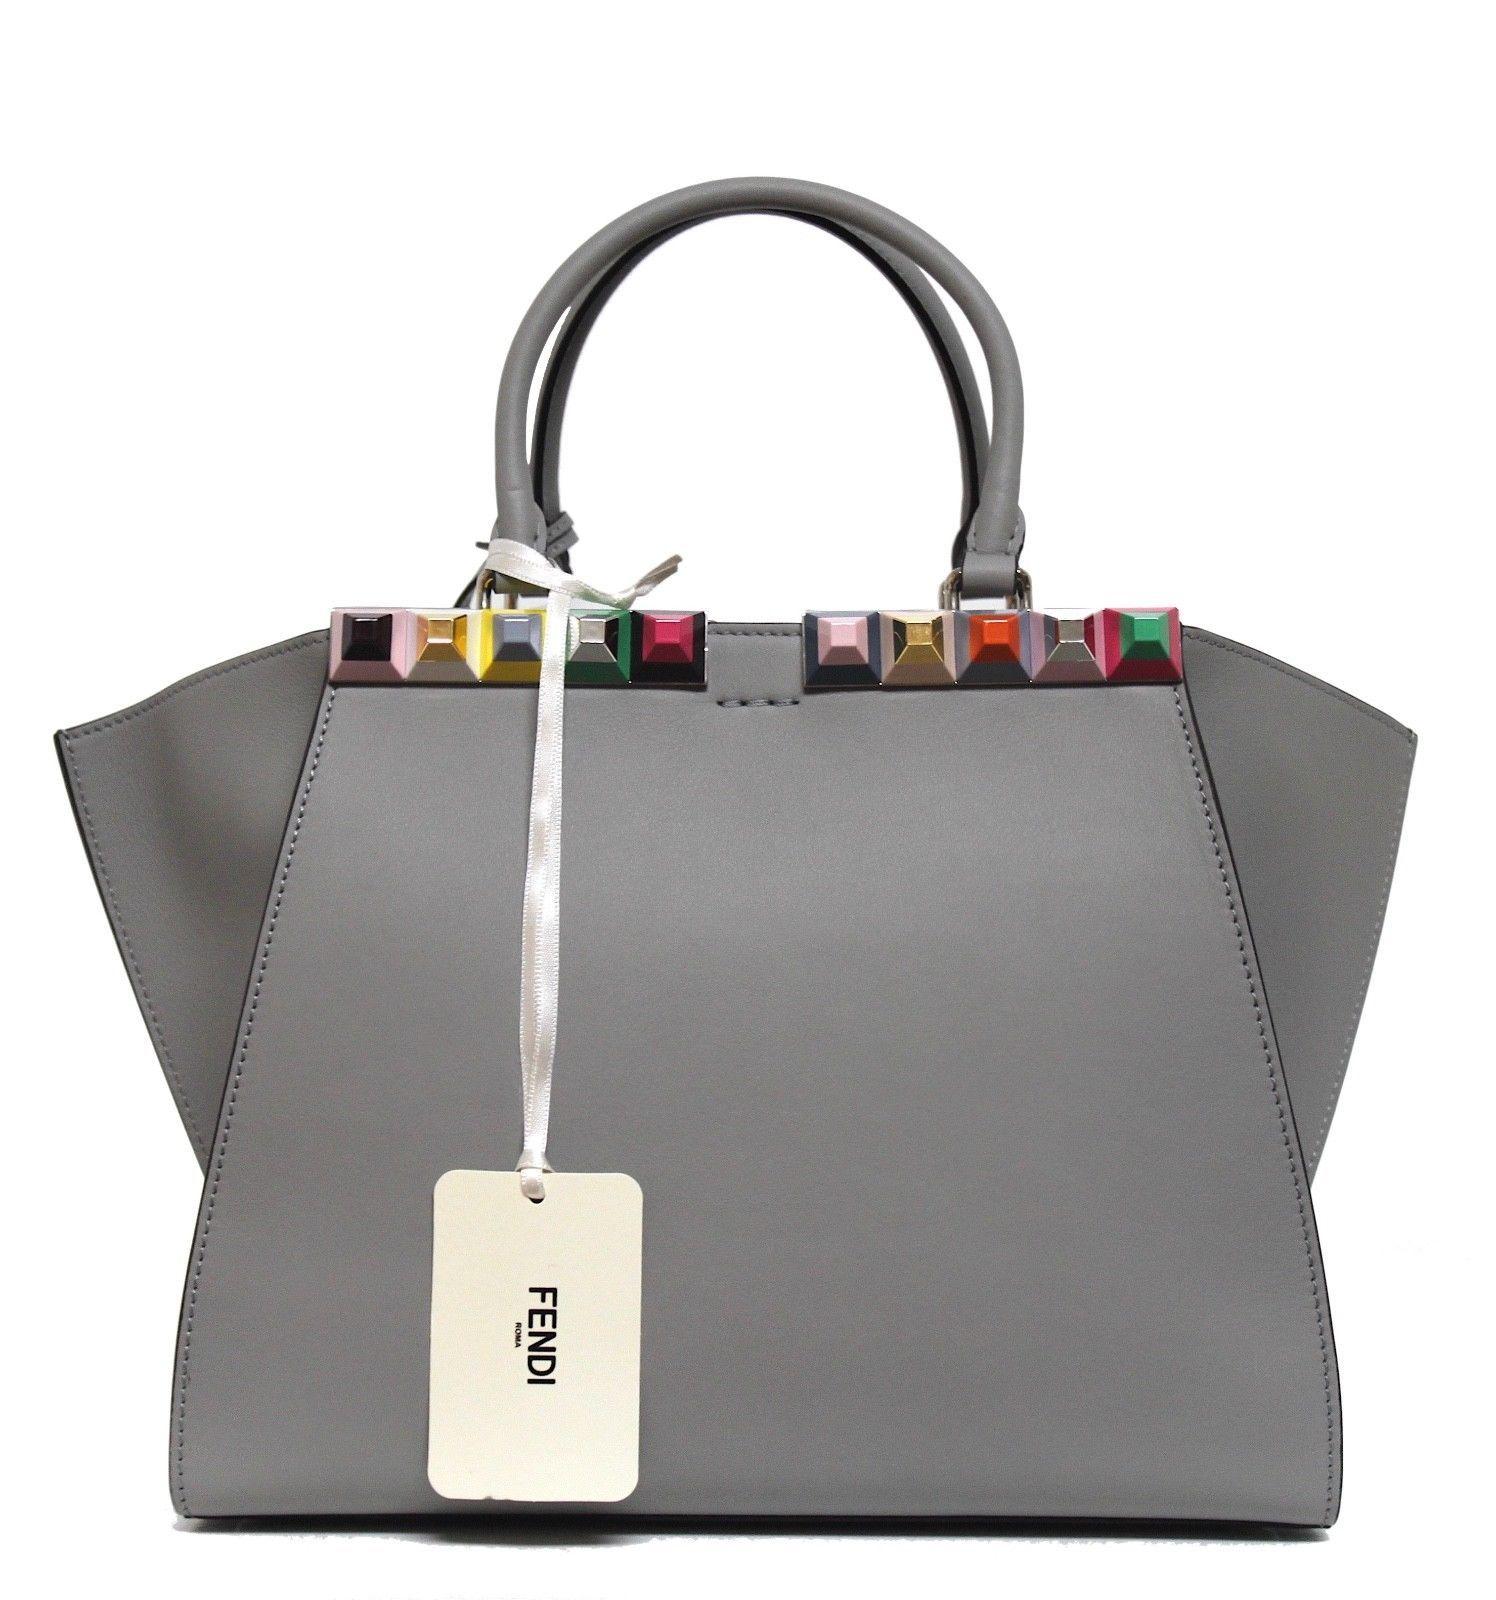 995a4c209e0c ... New  3500 Fendi 3Jours Studded Leather Shopper Printed Studs Palladium  Bag ...